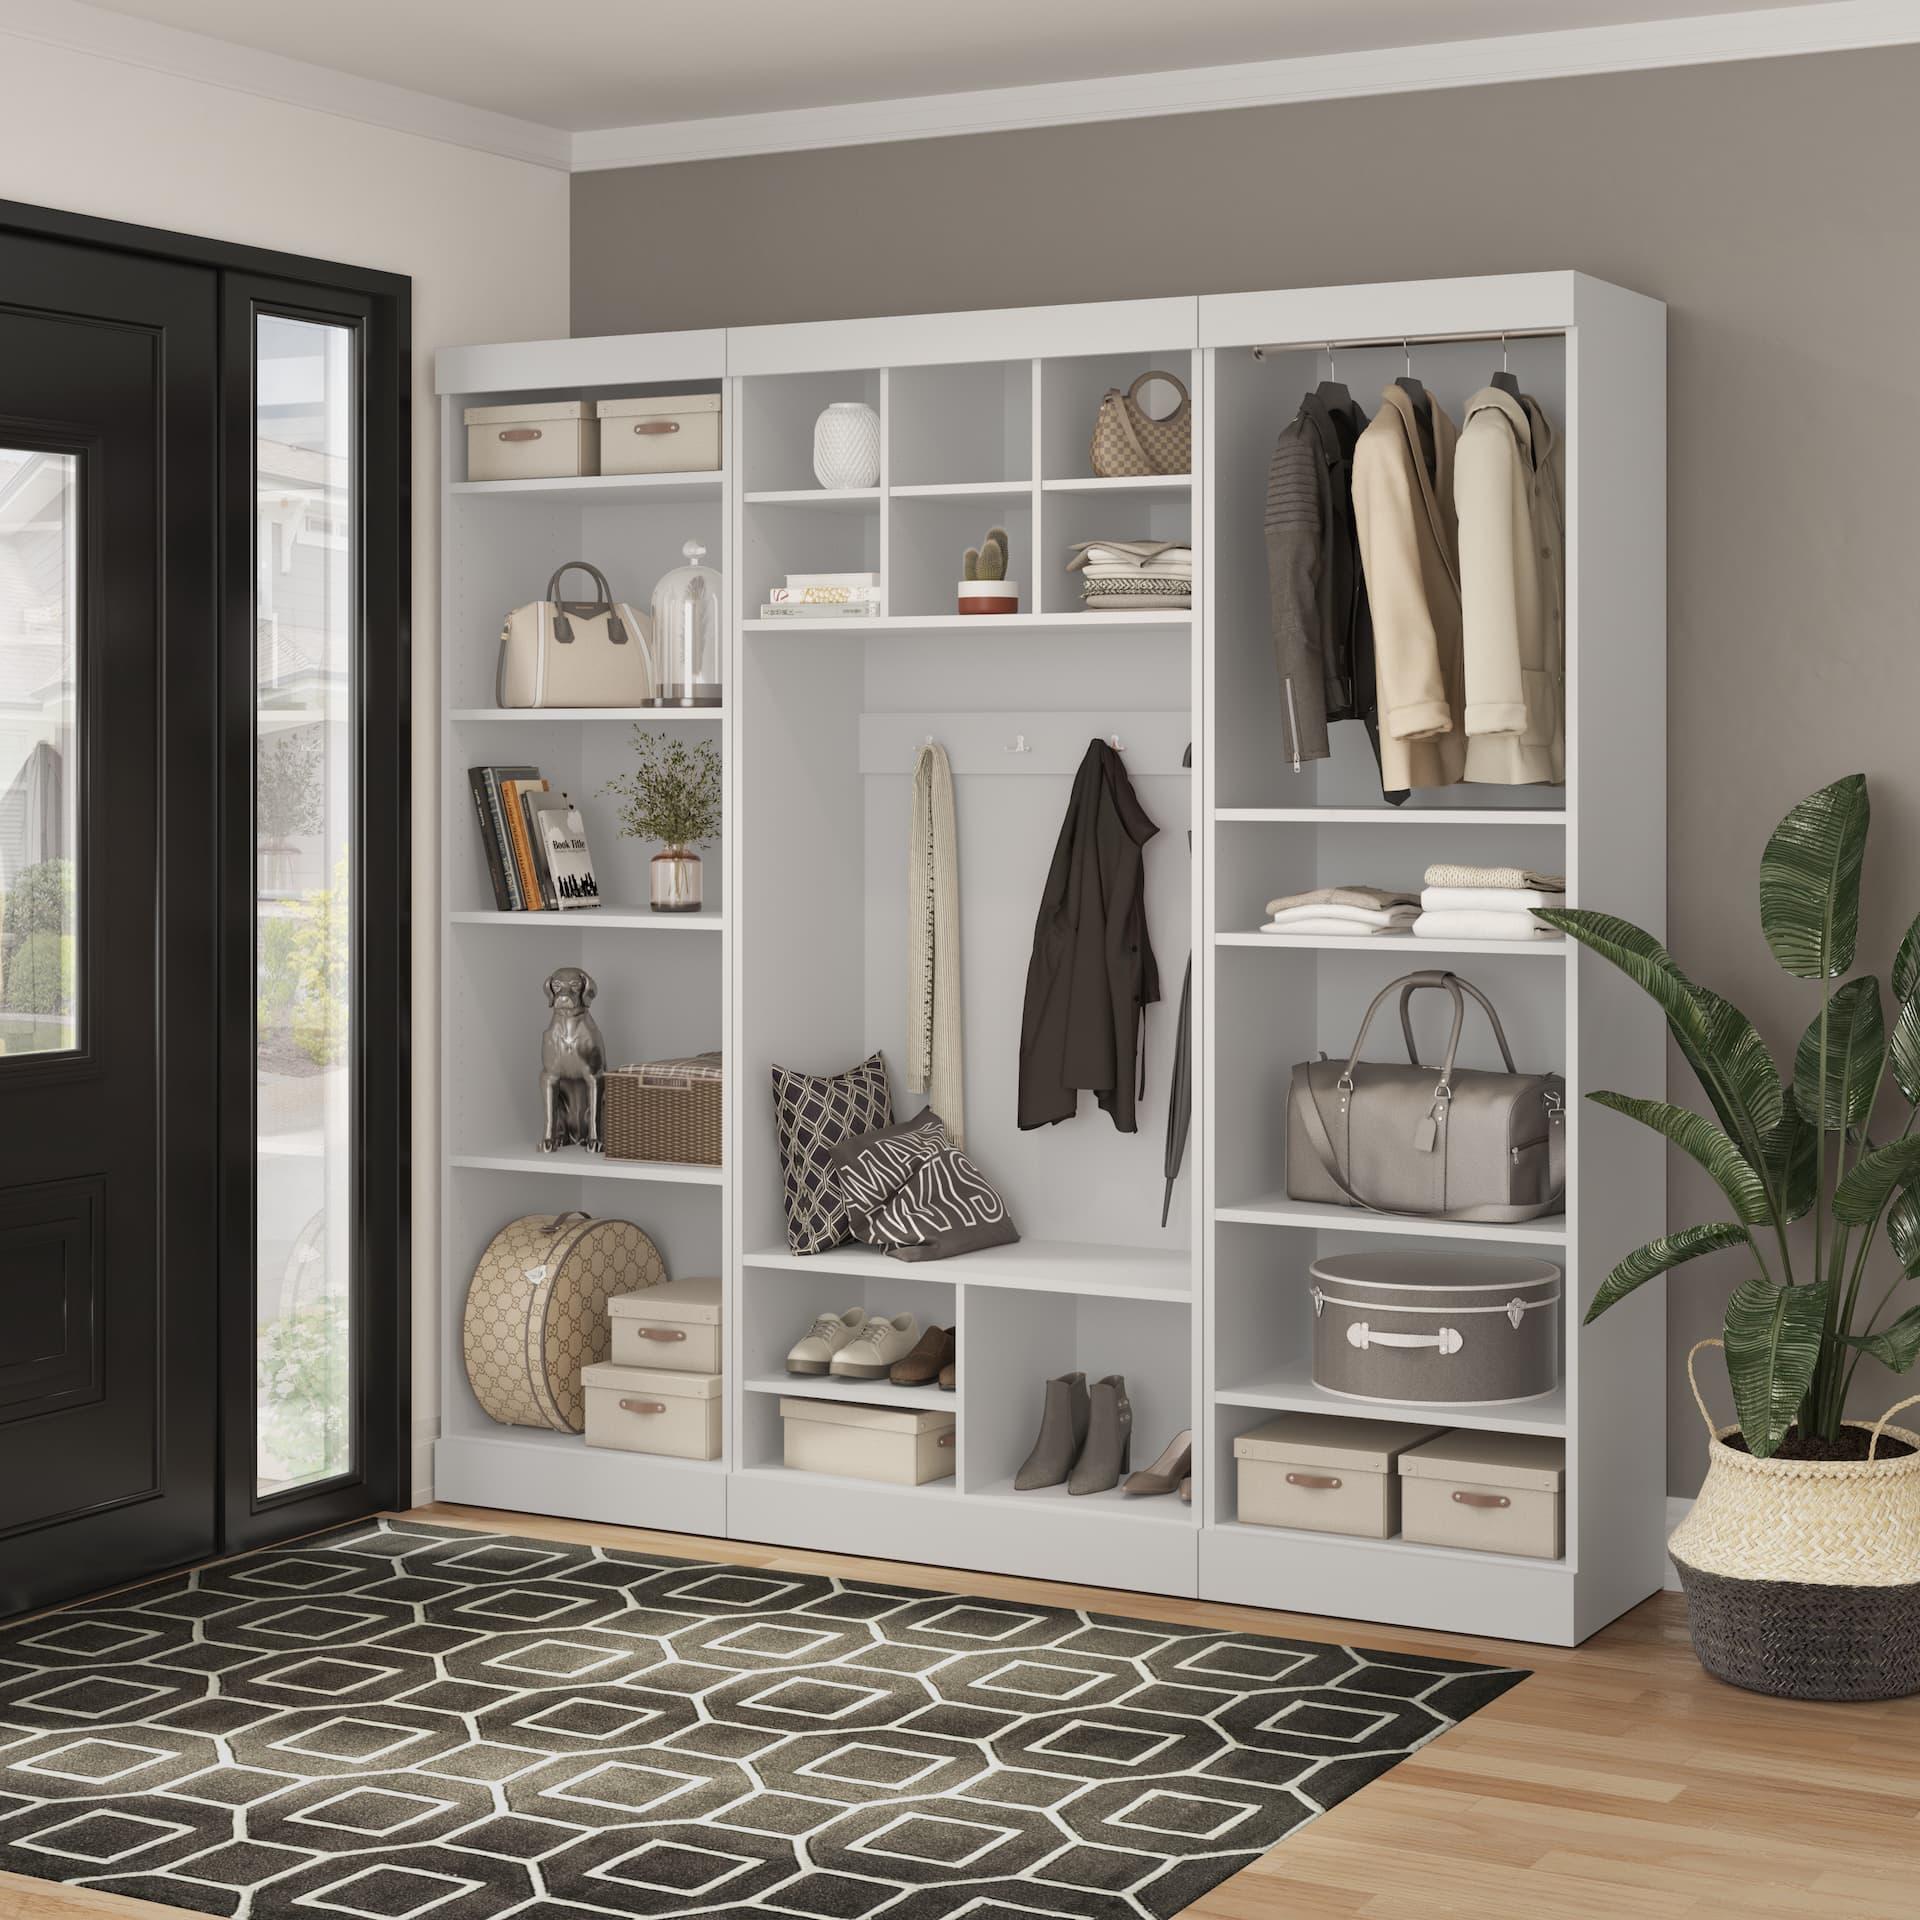 mudroom and closet organizer